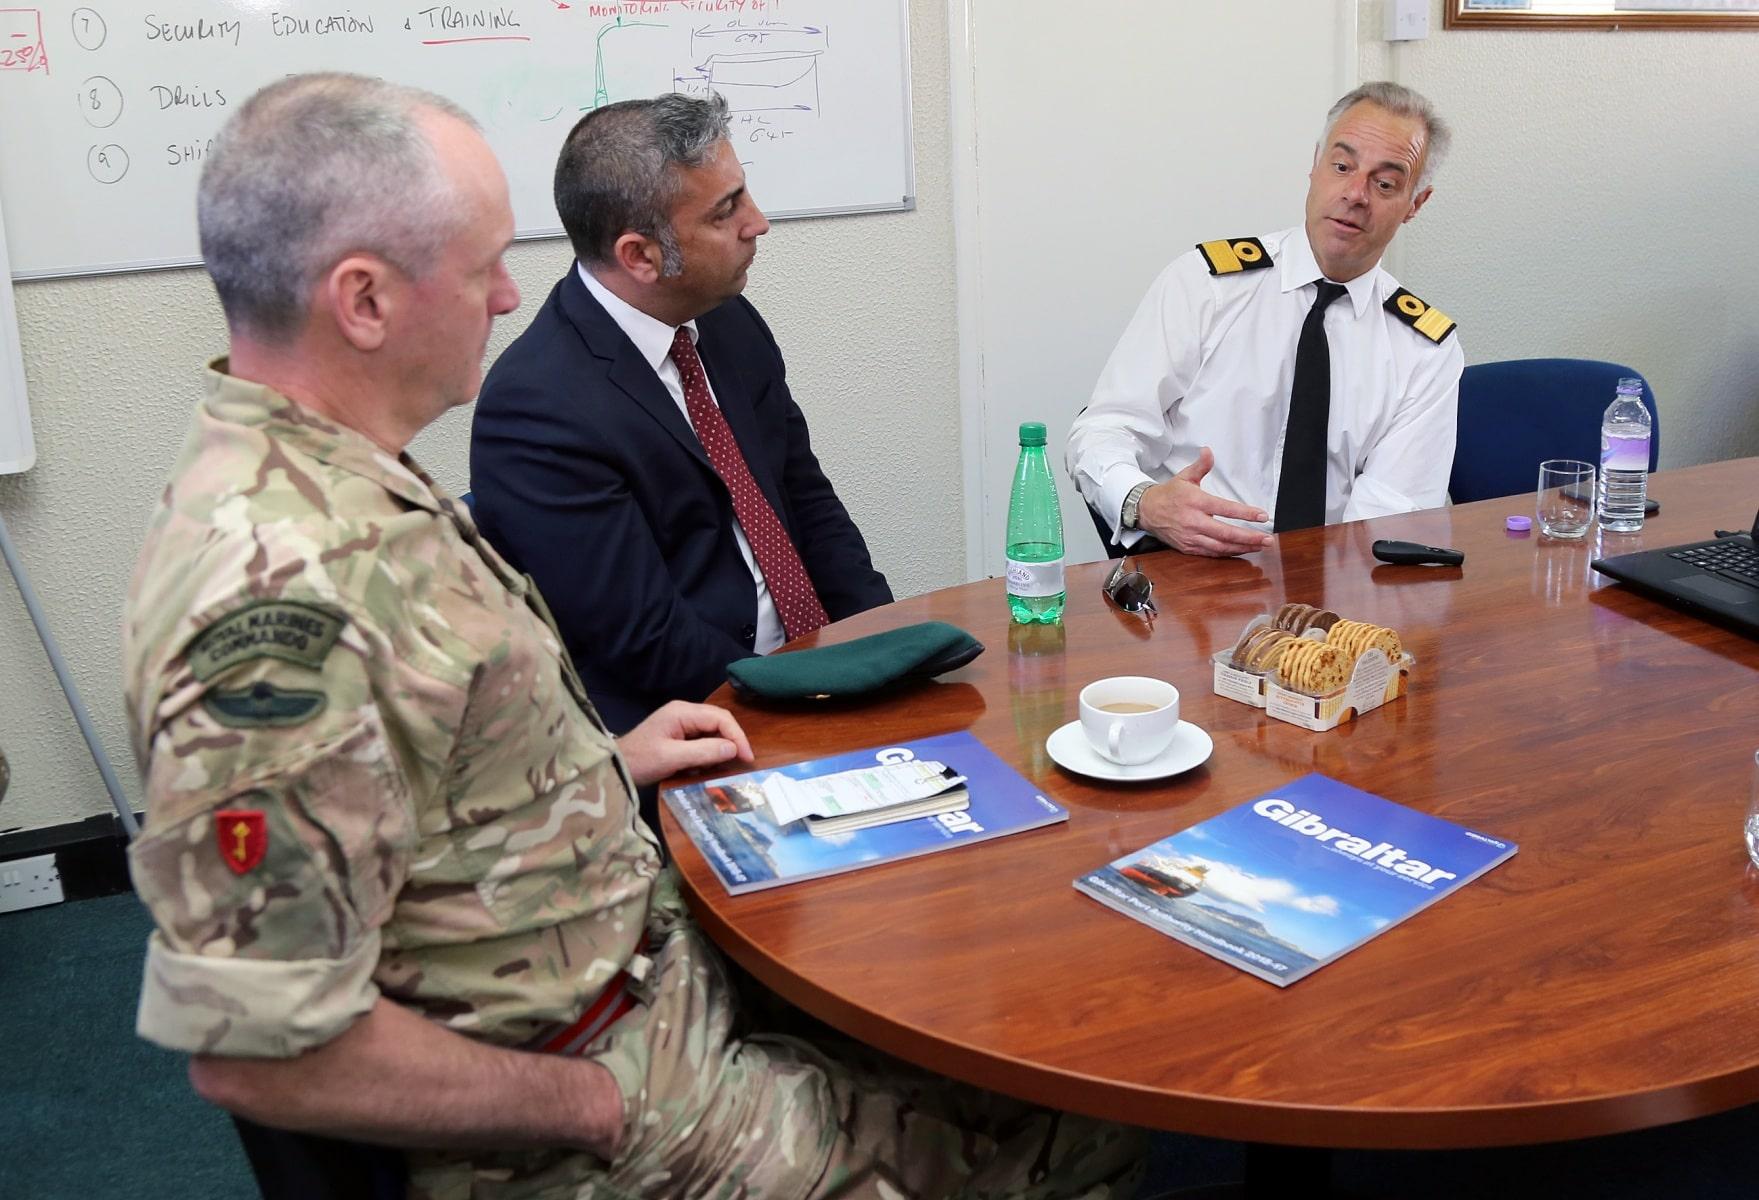 visita-oficial-del-gobernador-al-puerto-de-gibraltar_25881623510_o